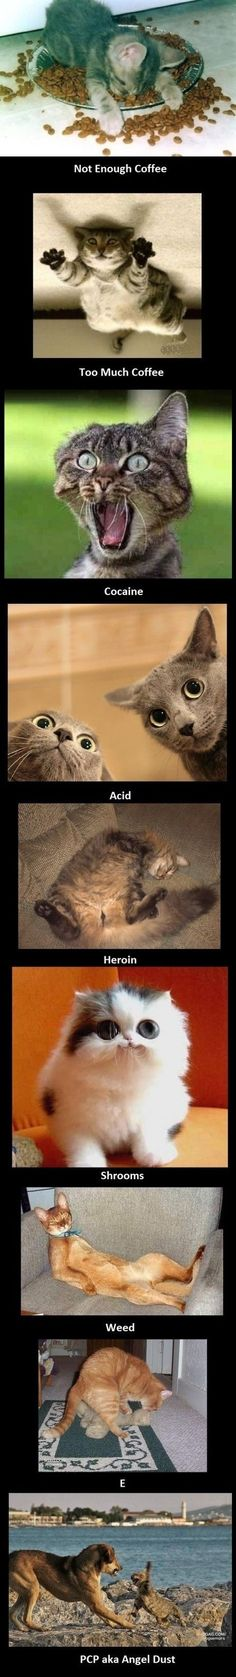 Pets: